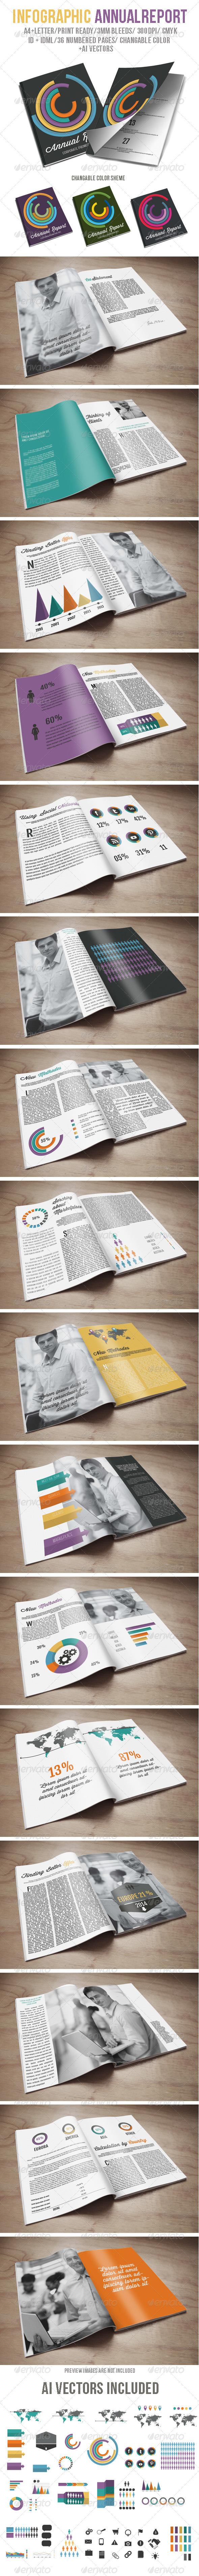 GraphicRiver Infographic Annual Report 6315764